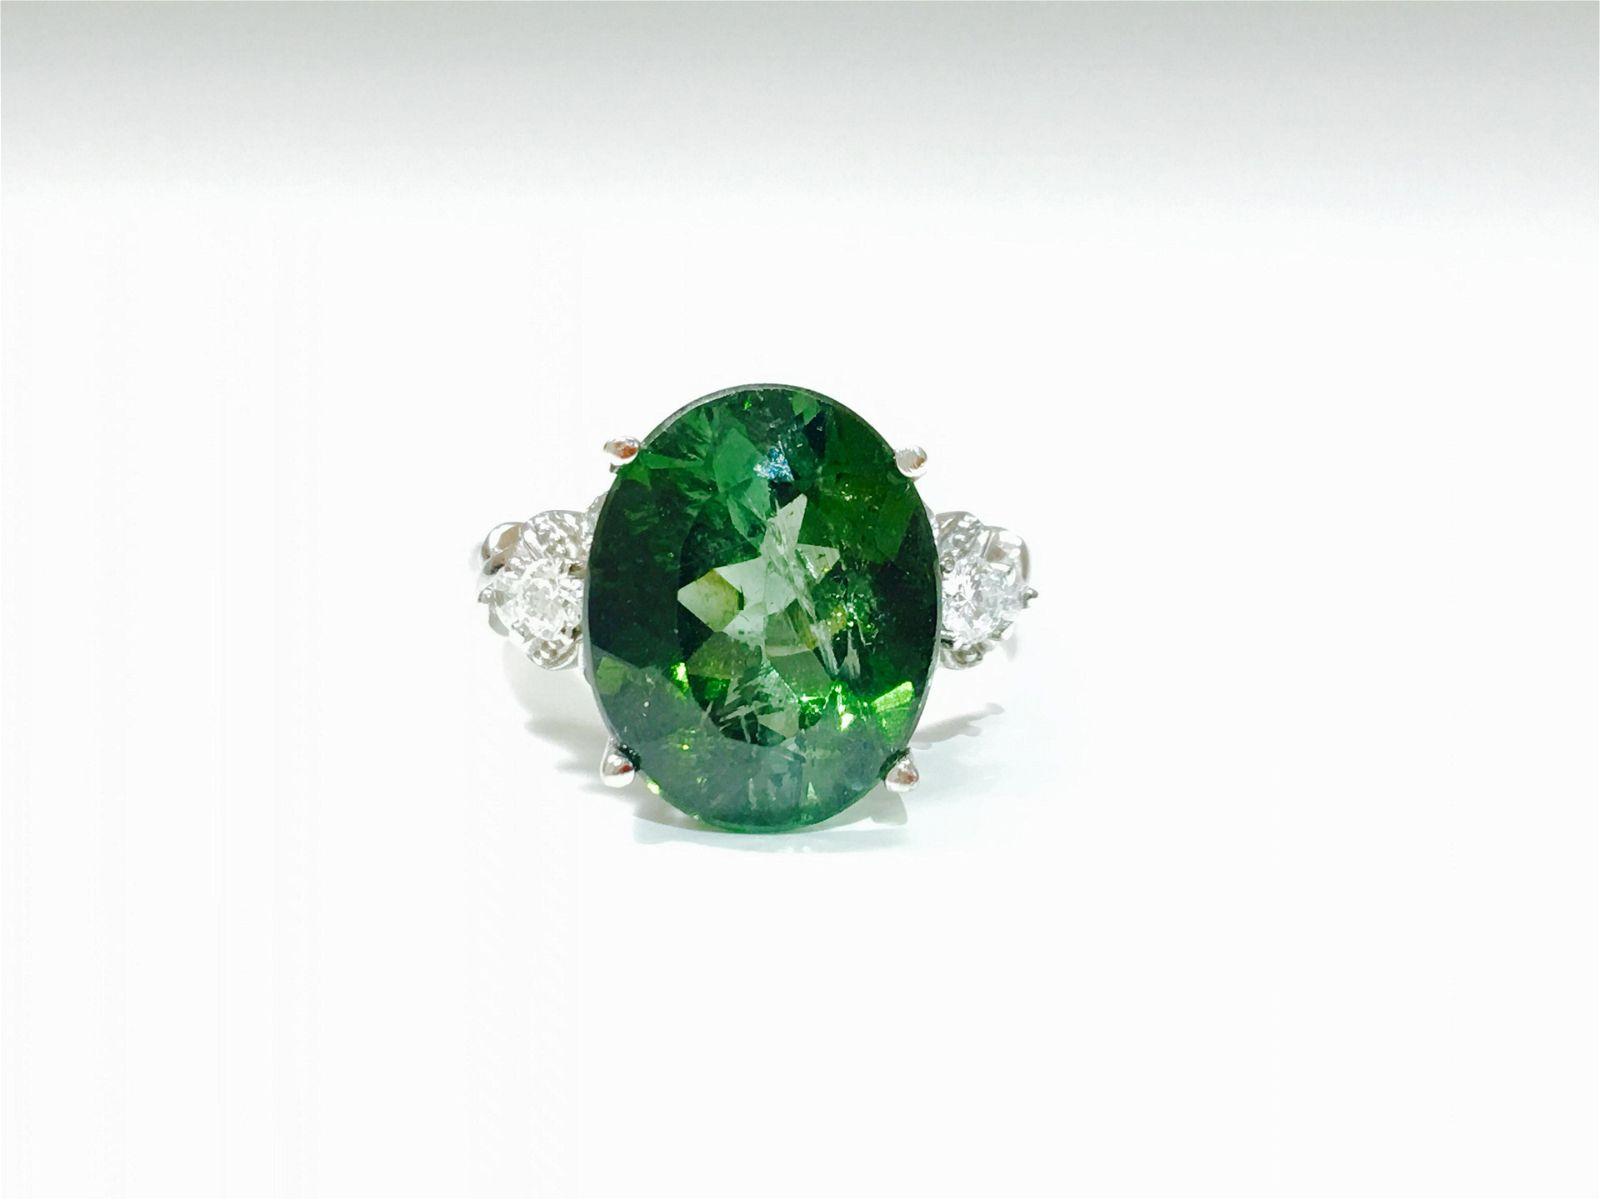 14K Gold, Andalusite & VS Diamond Ladies Ring